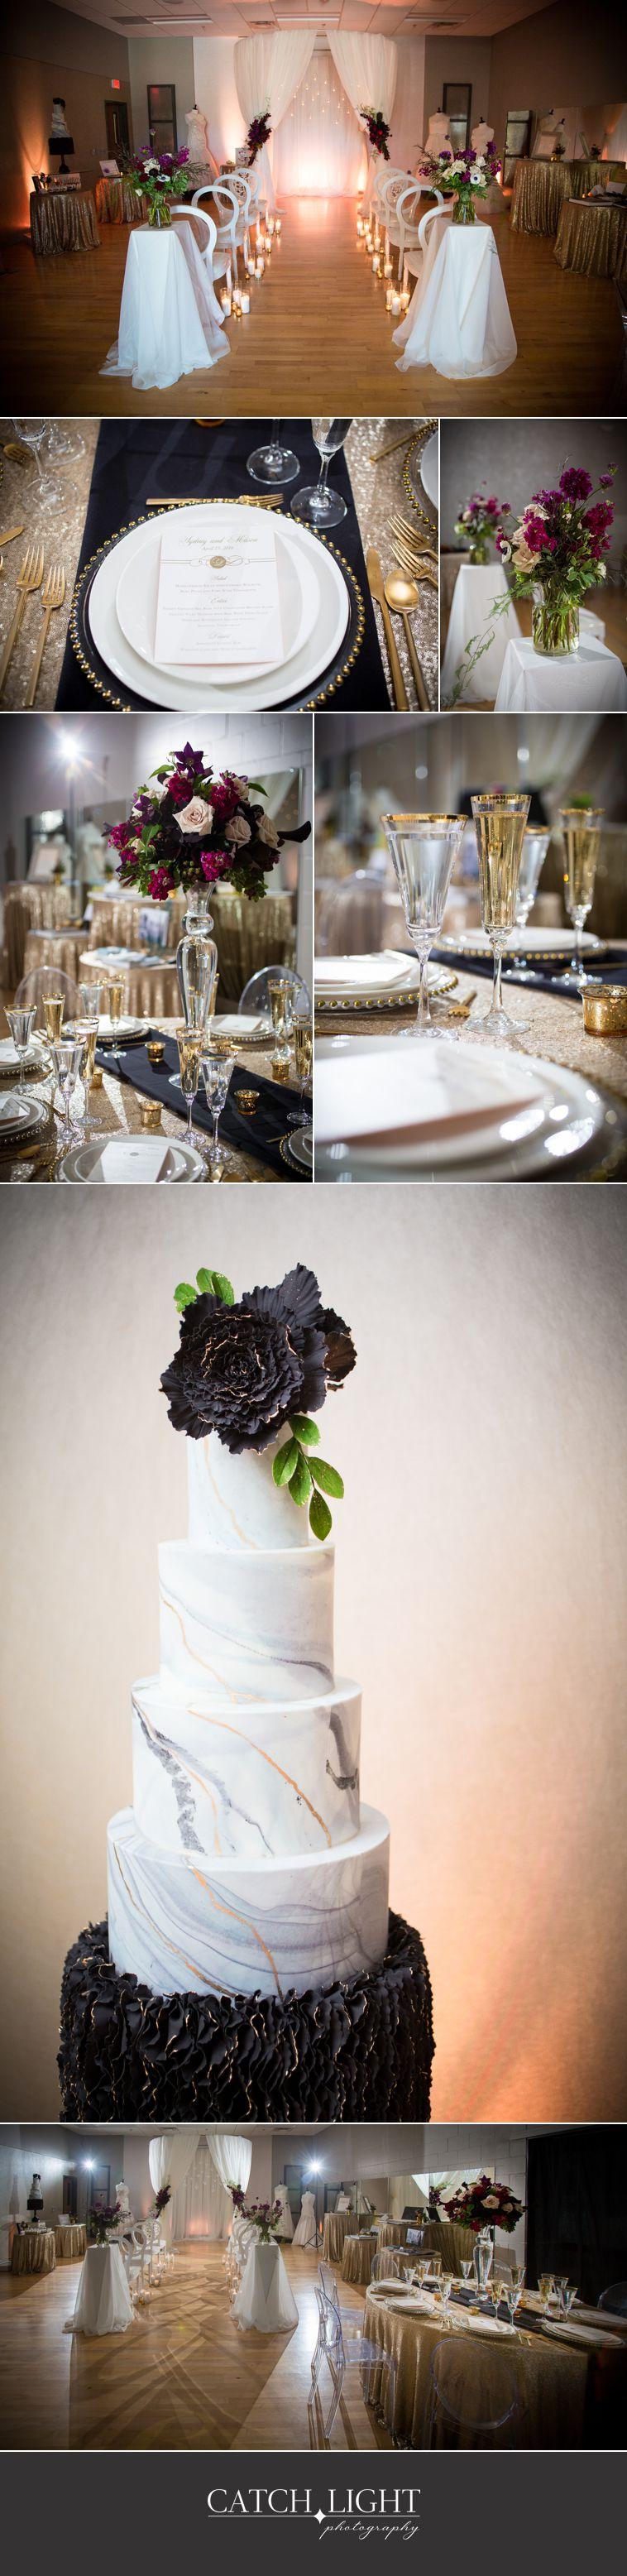 kansas-city-wedding-vendors-3